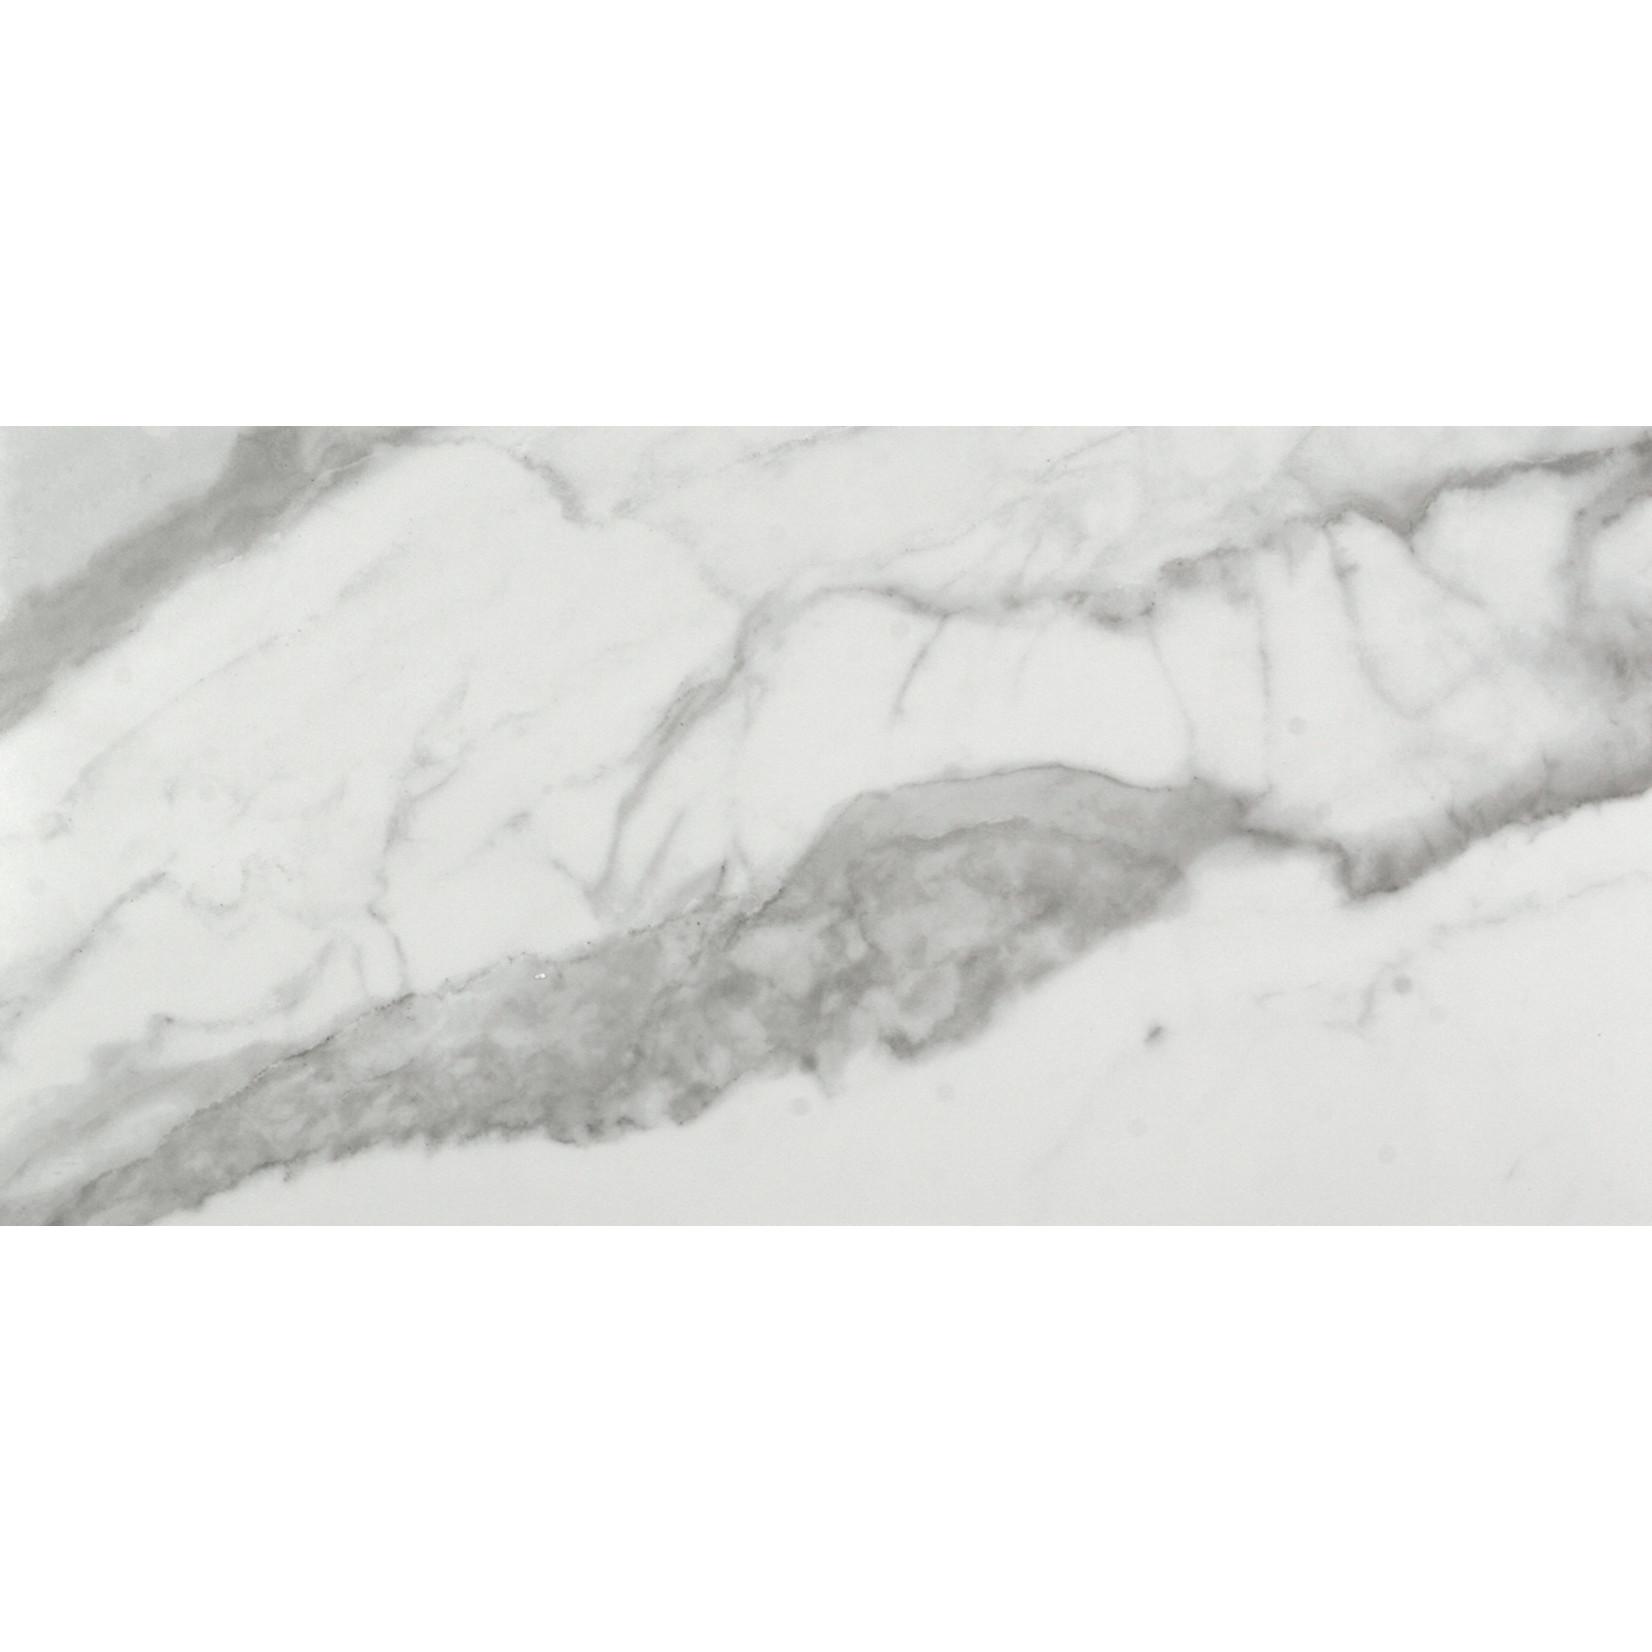 Ceramic Eterna Calacatta gray 12x24 polished (16 per box)